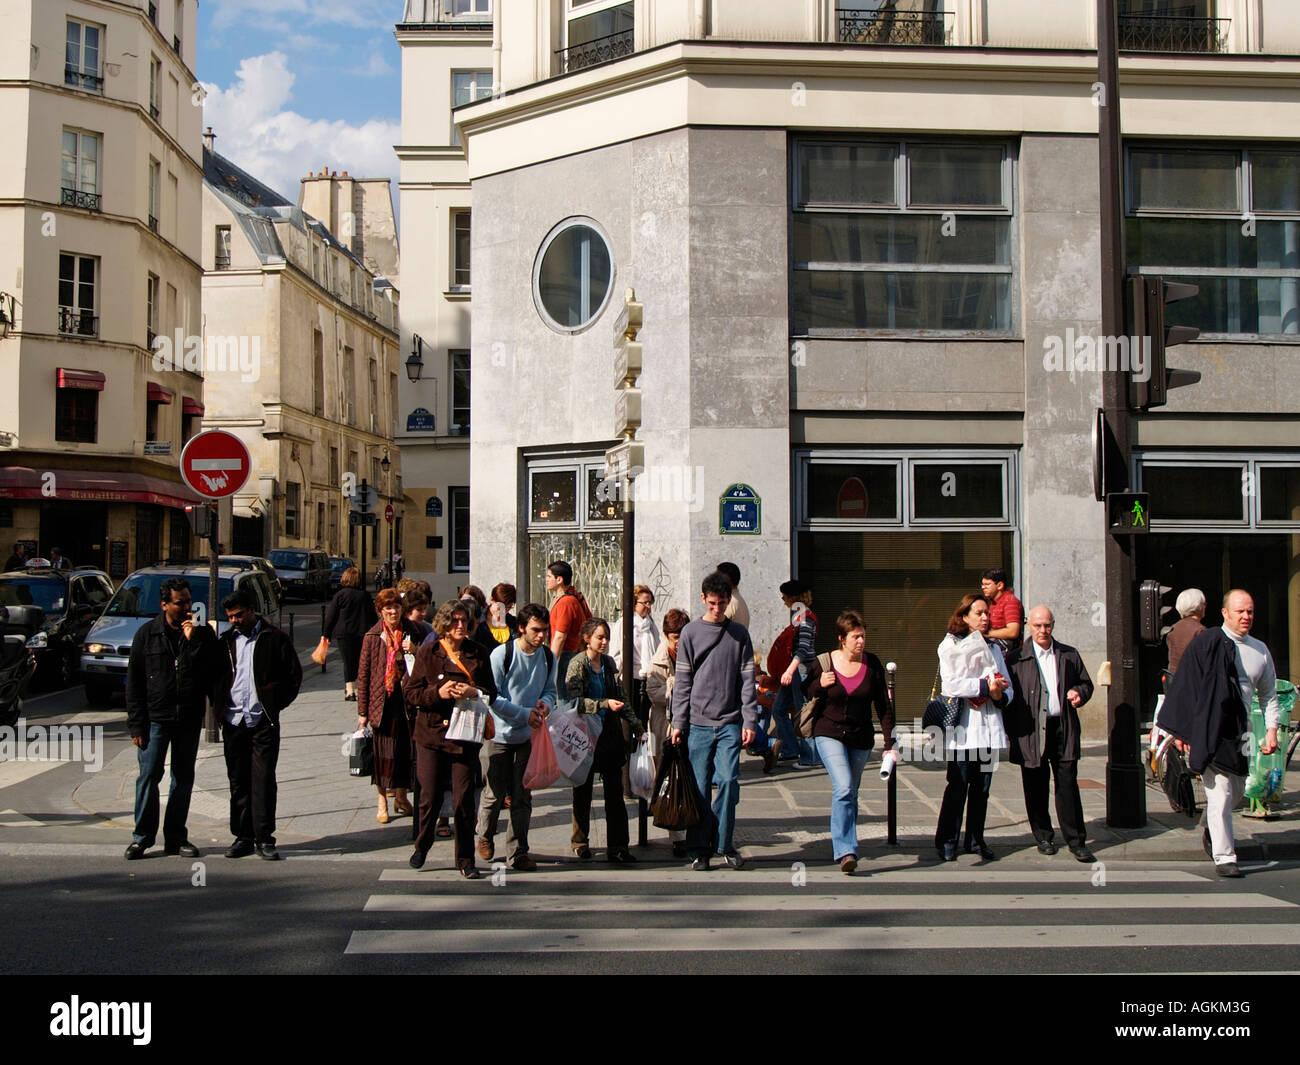 Collection of average Parisians crossing the street Rue de Rivoli Paris France - Stock Image